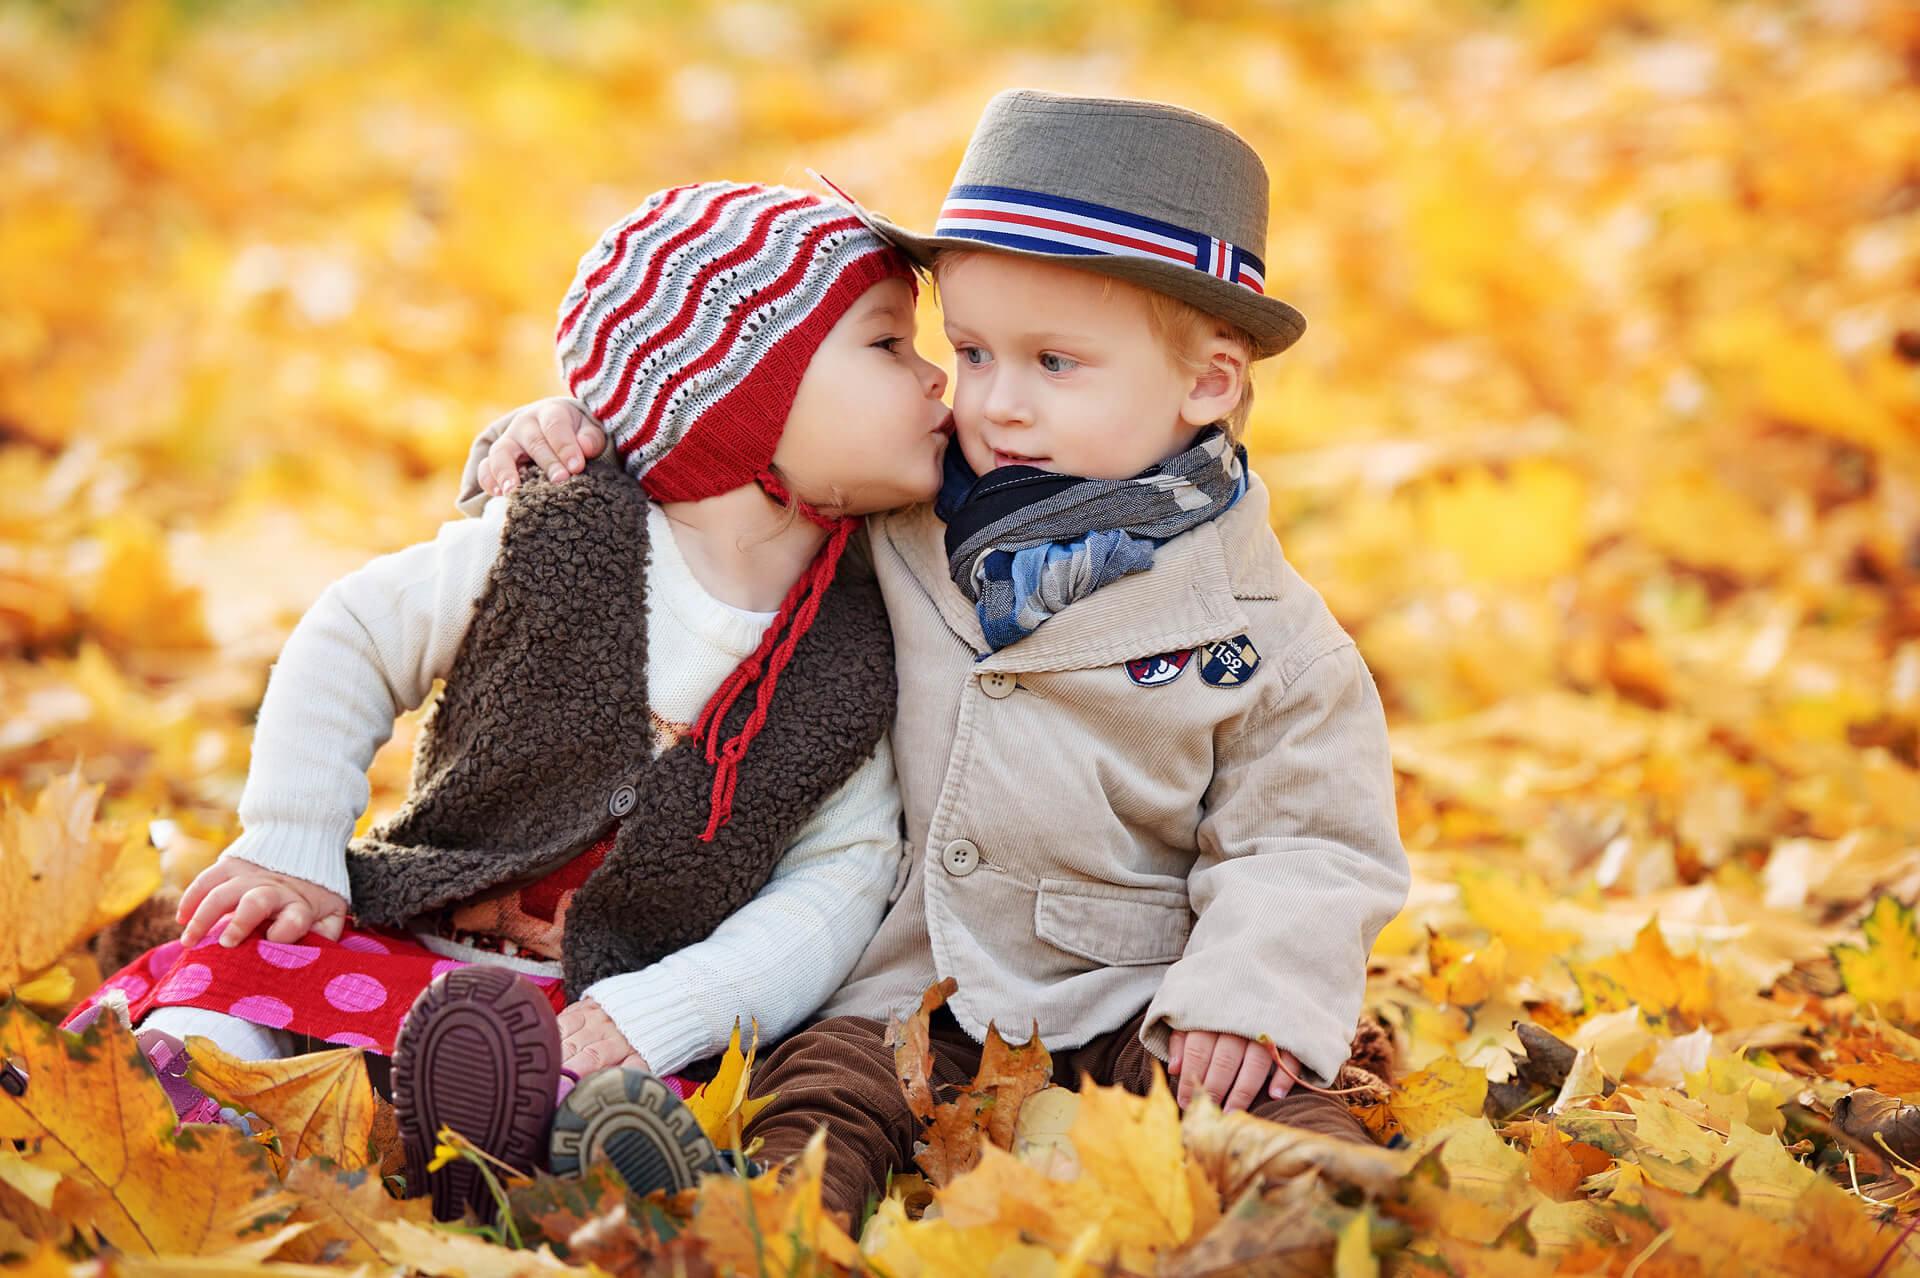 profesionalny fotograf Peter Norulak Kosice umelecke fotky deti exterier priroda jesen_10